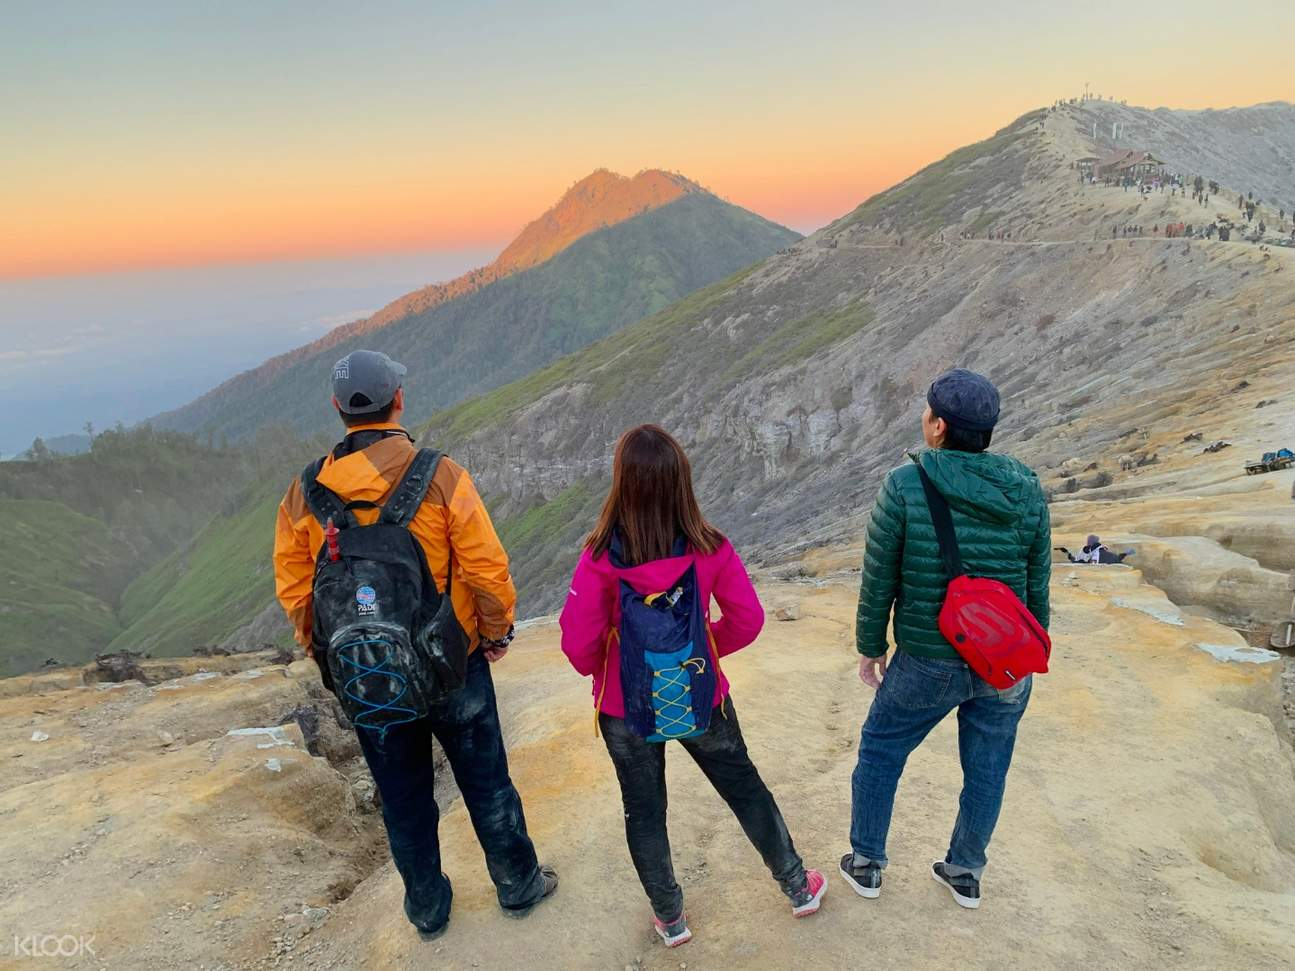 three people admiring the sunrise view